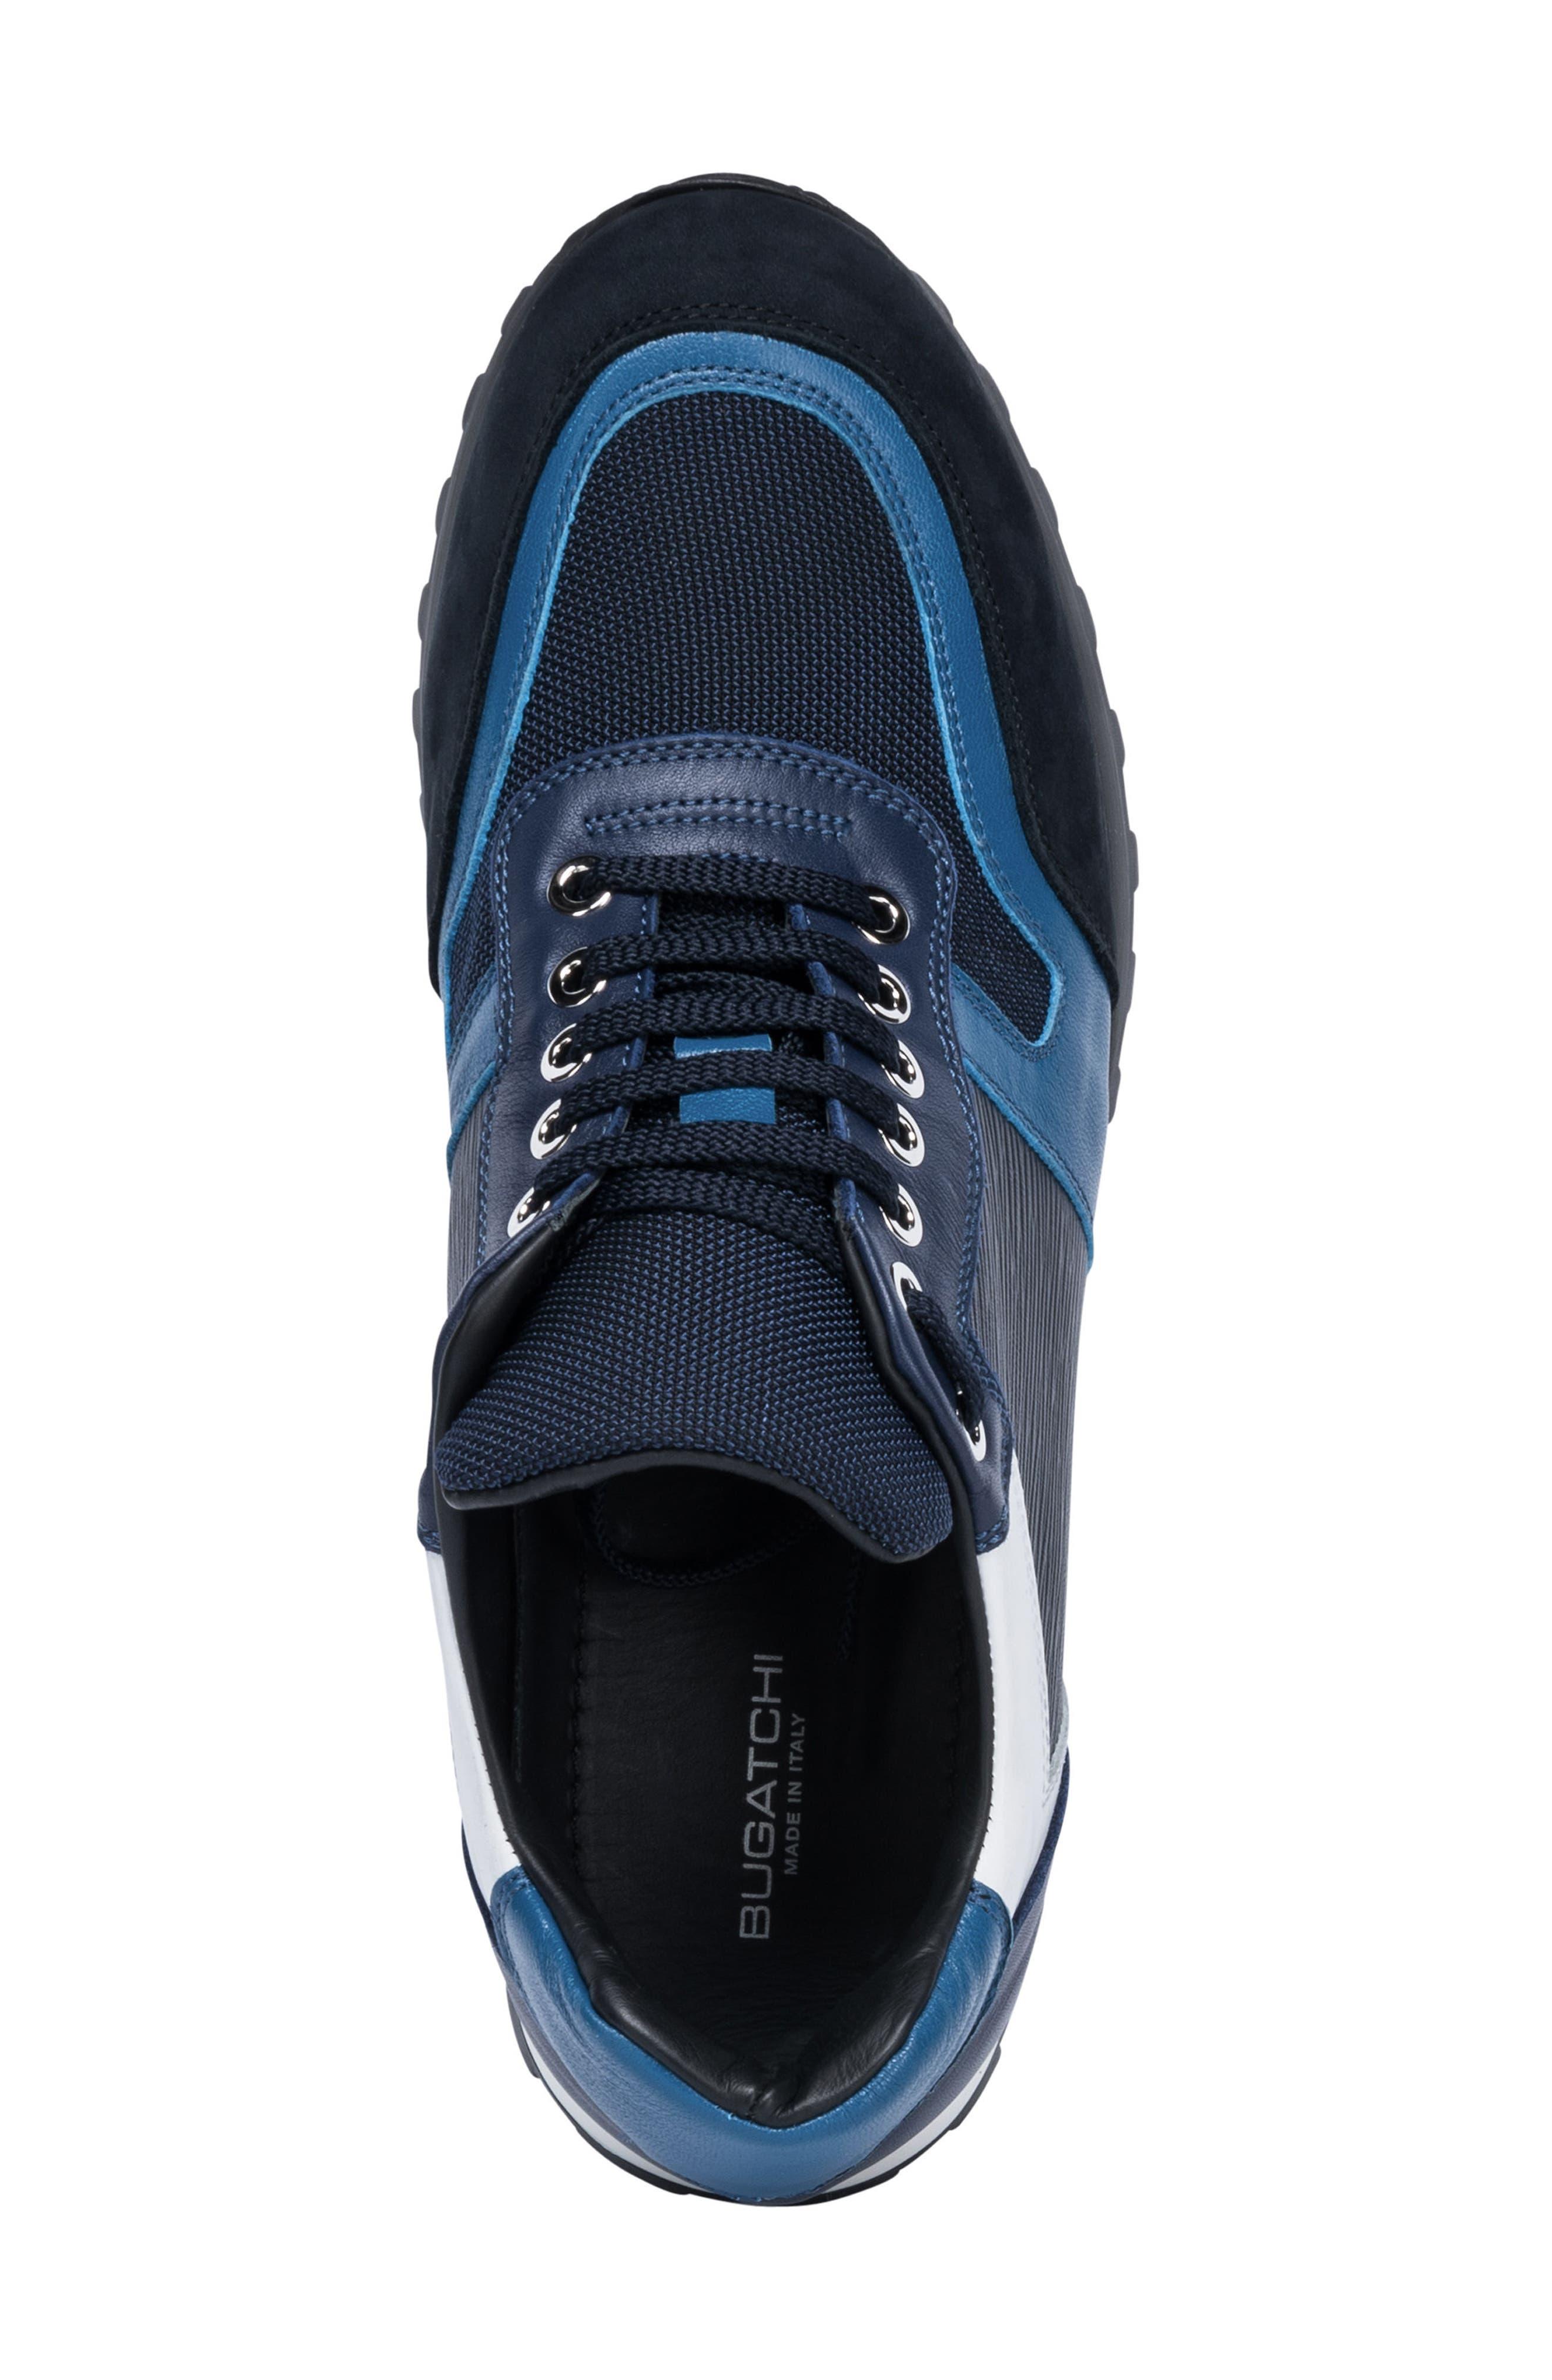 Modena Sneaker,                             Alternate thumbnail 5, color,                             Blue